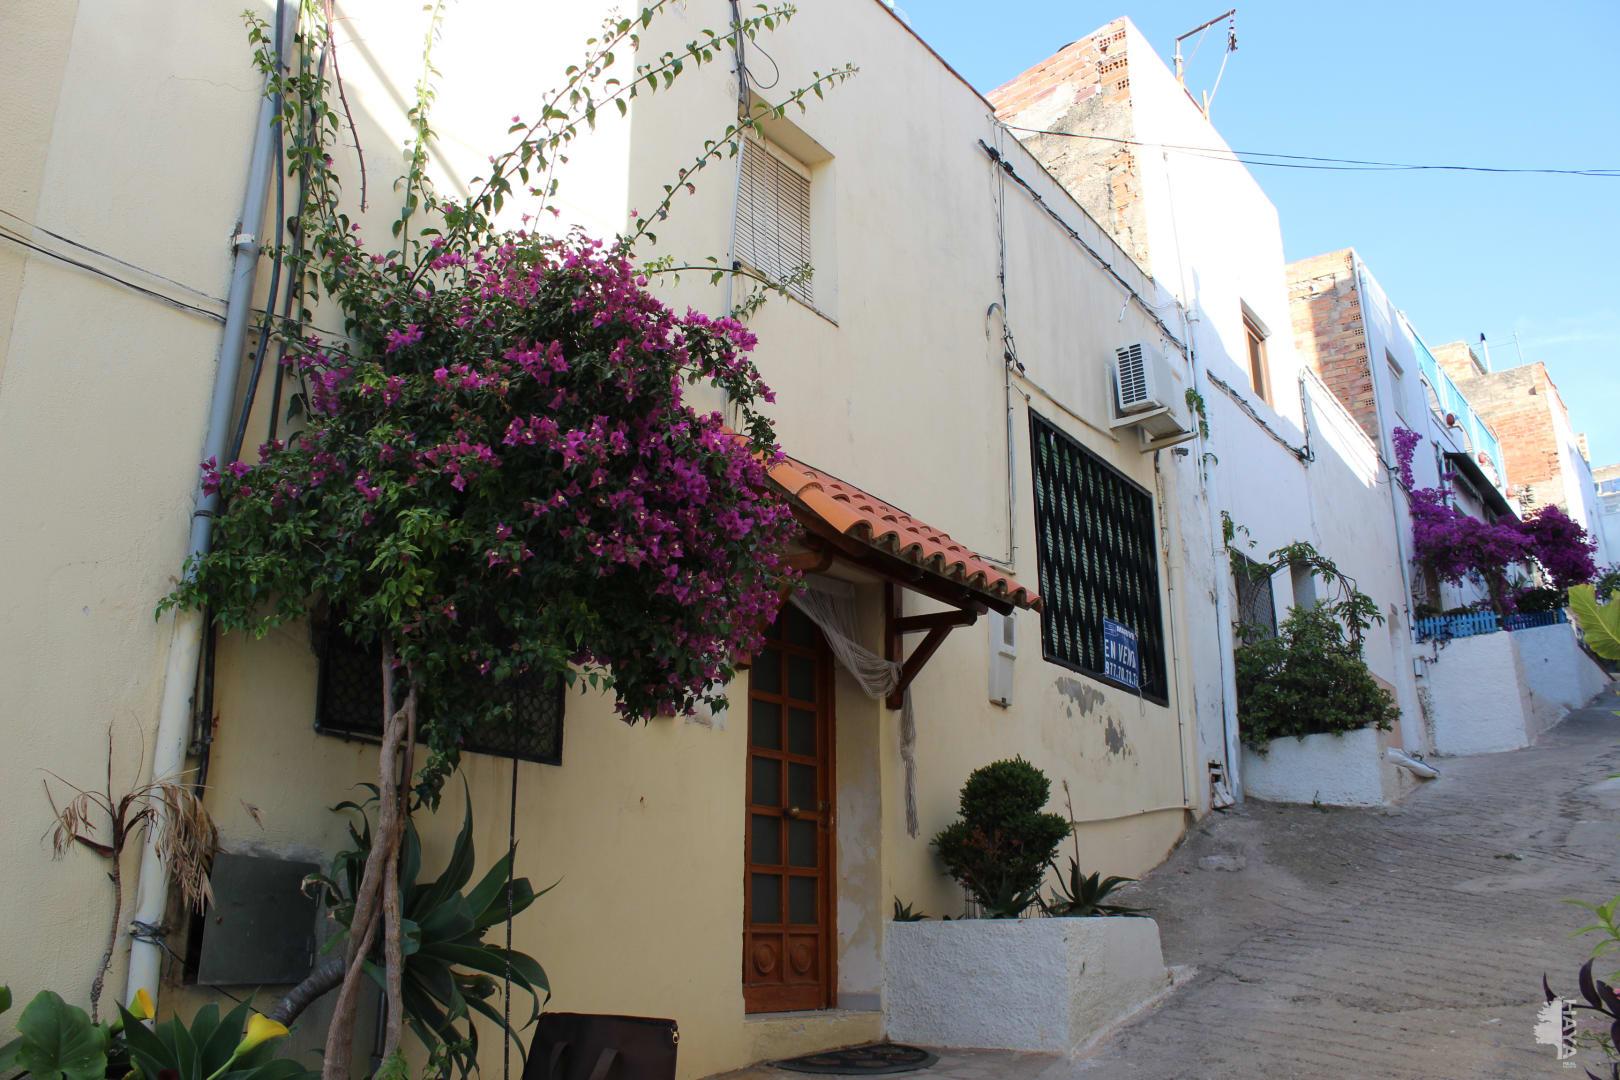 Casa en venta en Granja de Patorrat, Alcanar, Tarragona, Calle de Les Roques, 58.601 €, 2 habitaciones, 2 baños, 157 m2